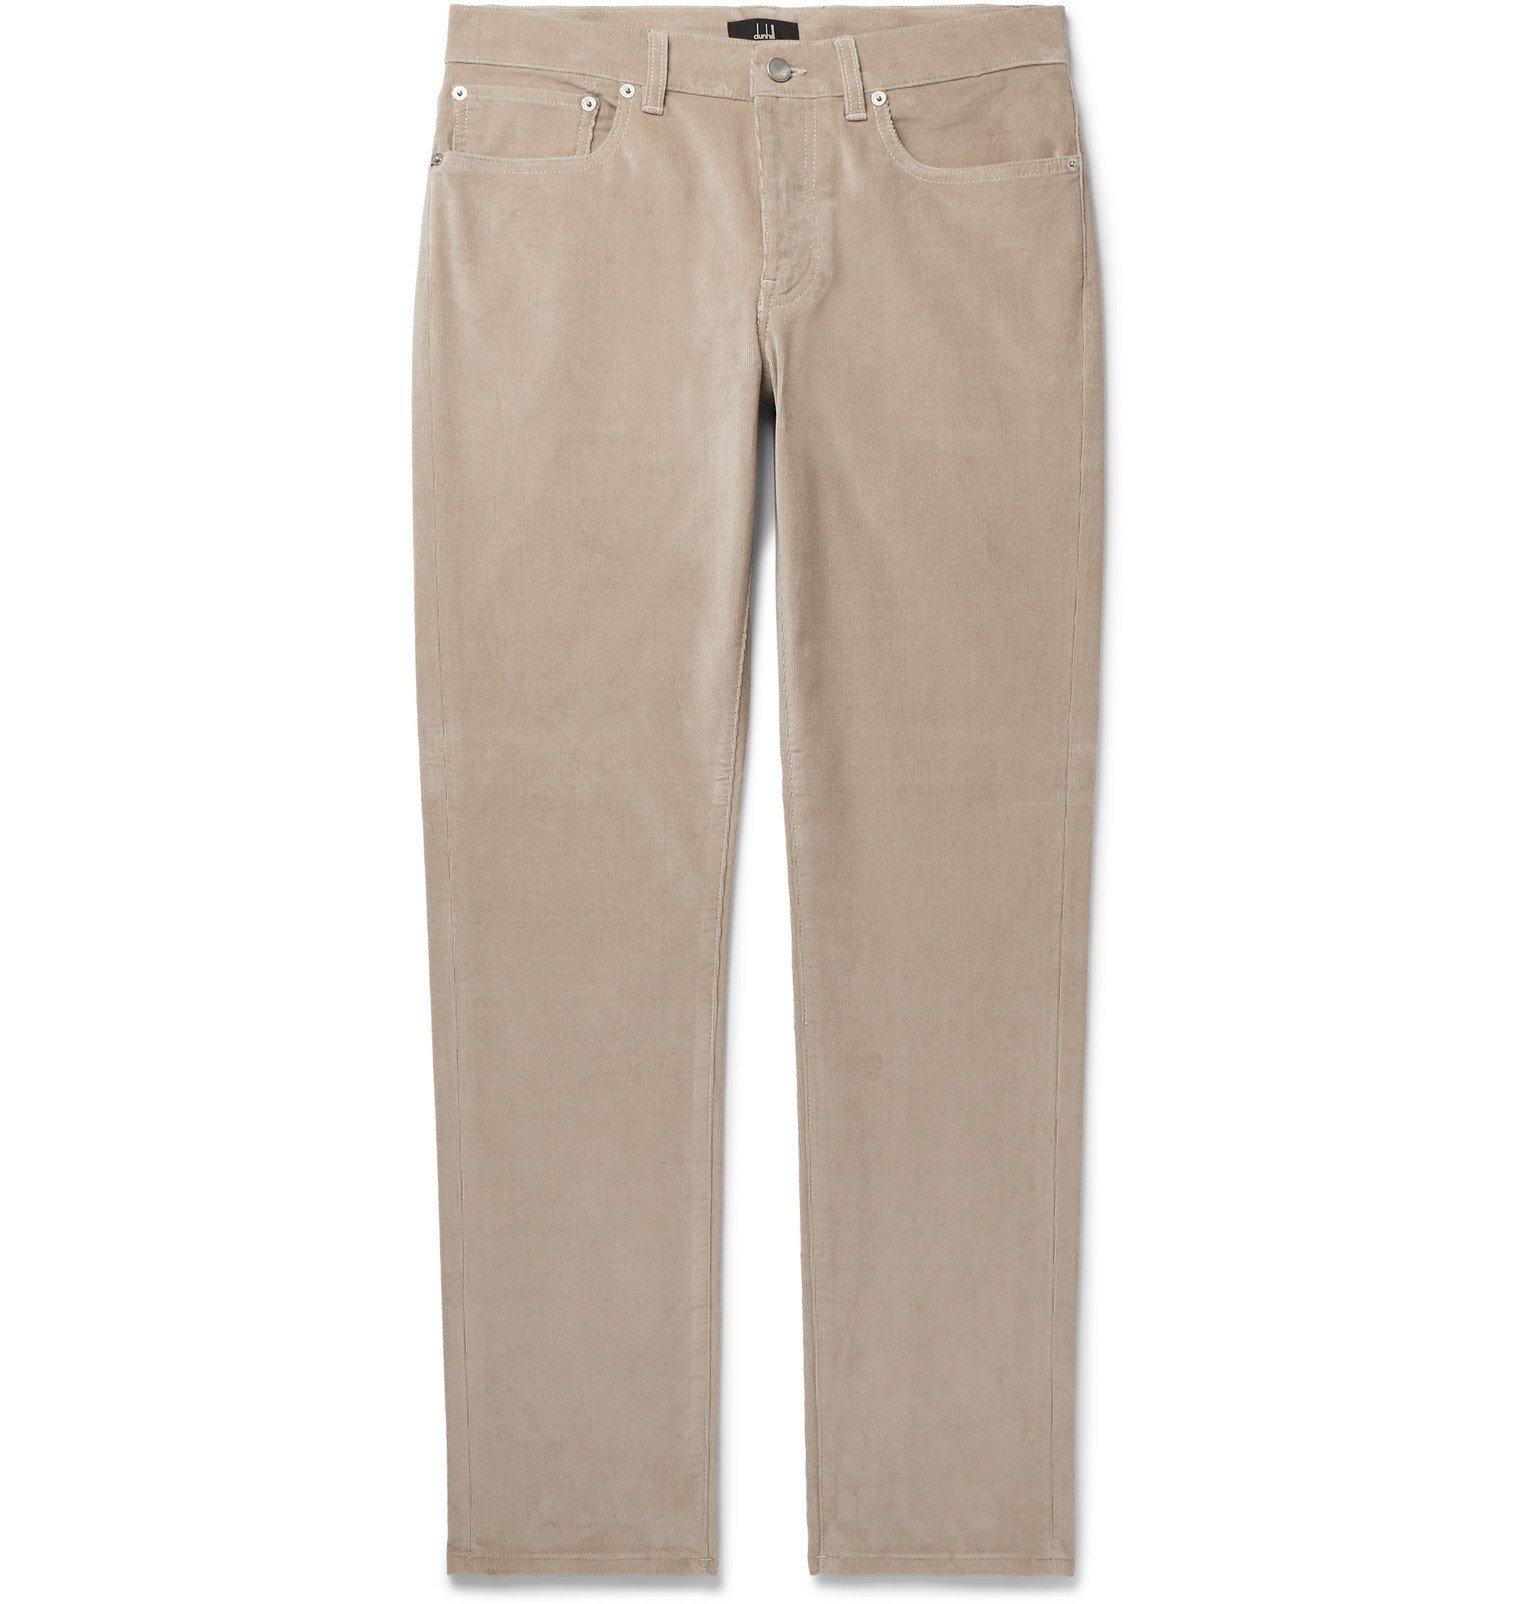 Dunhill - Black Slim-Fit Stretch-Cotton Corduroy Trousers - Neutrals